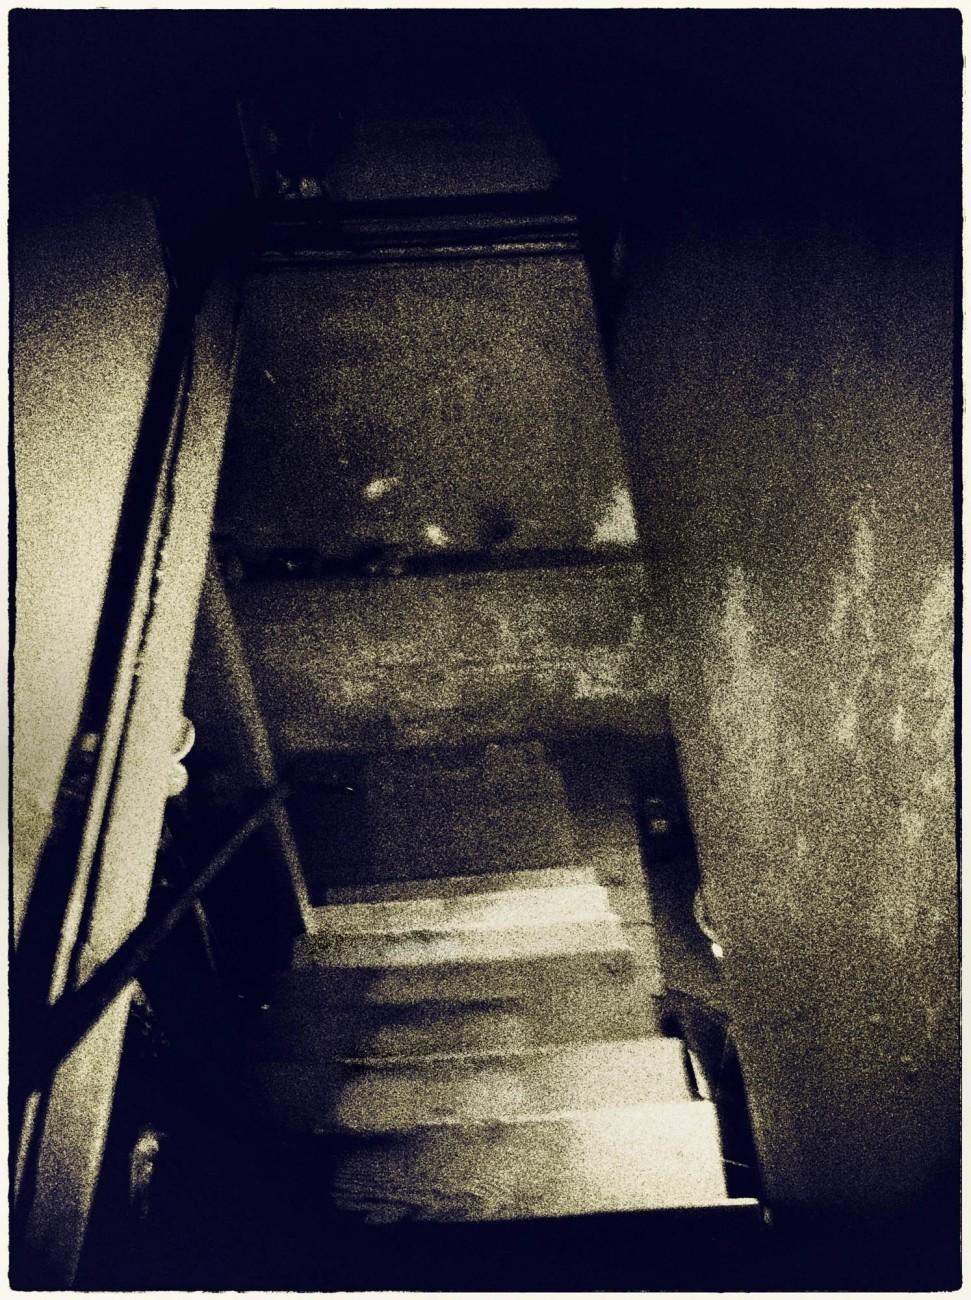 staircase descent.jpg